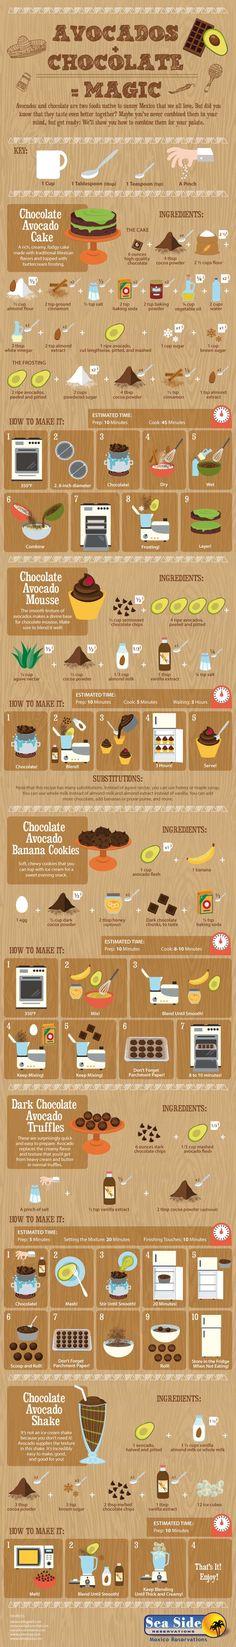 Avocados Plus Chocolate = Magic! #infographic #Chocolate #Cake #Food